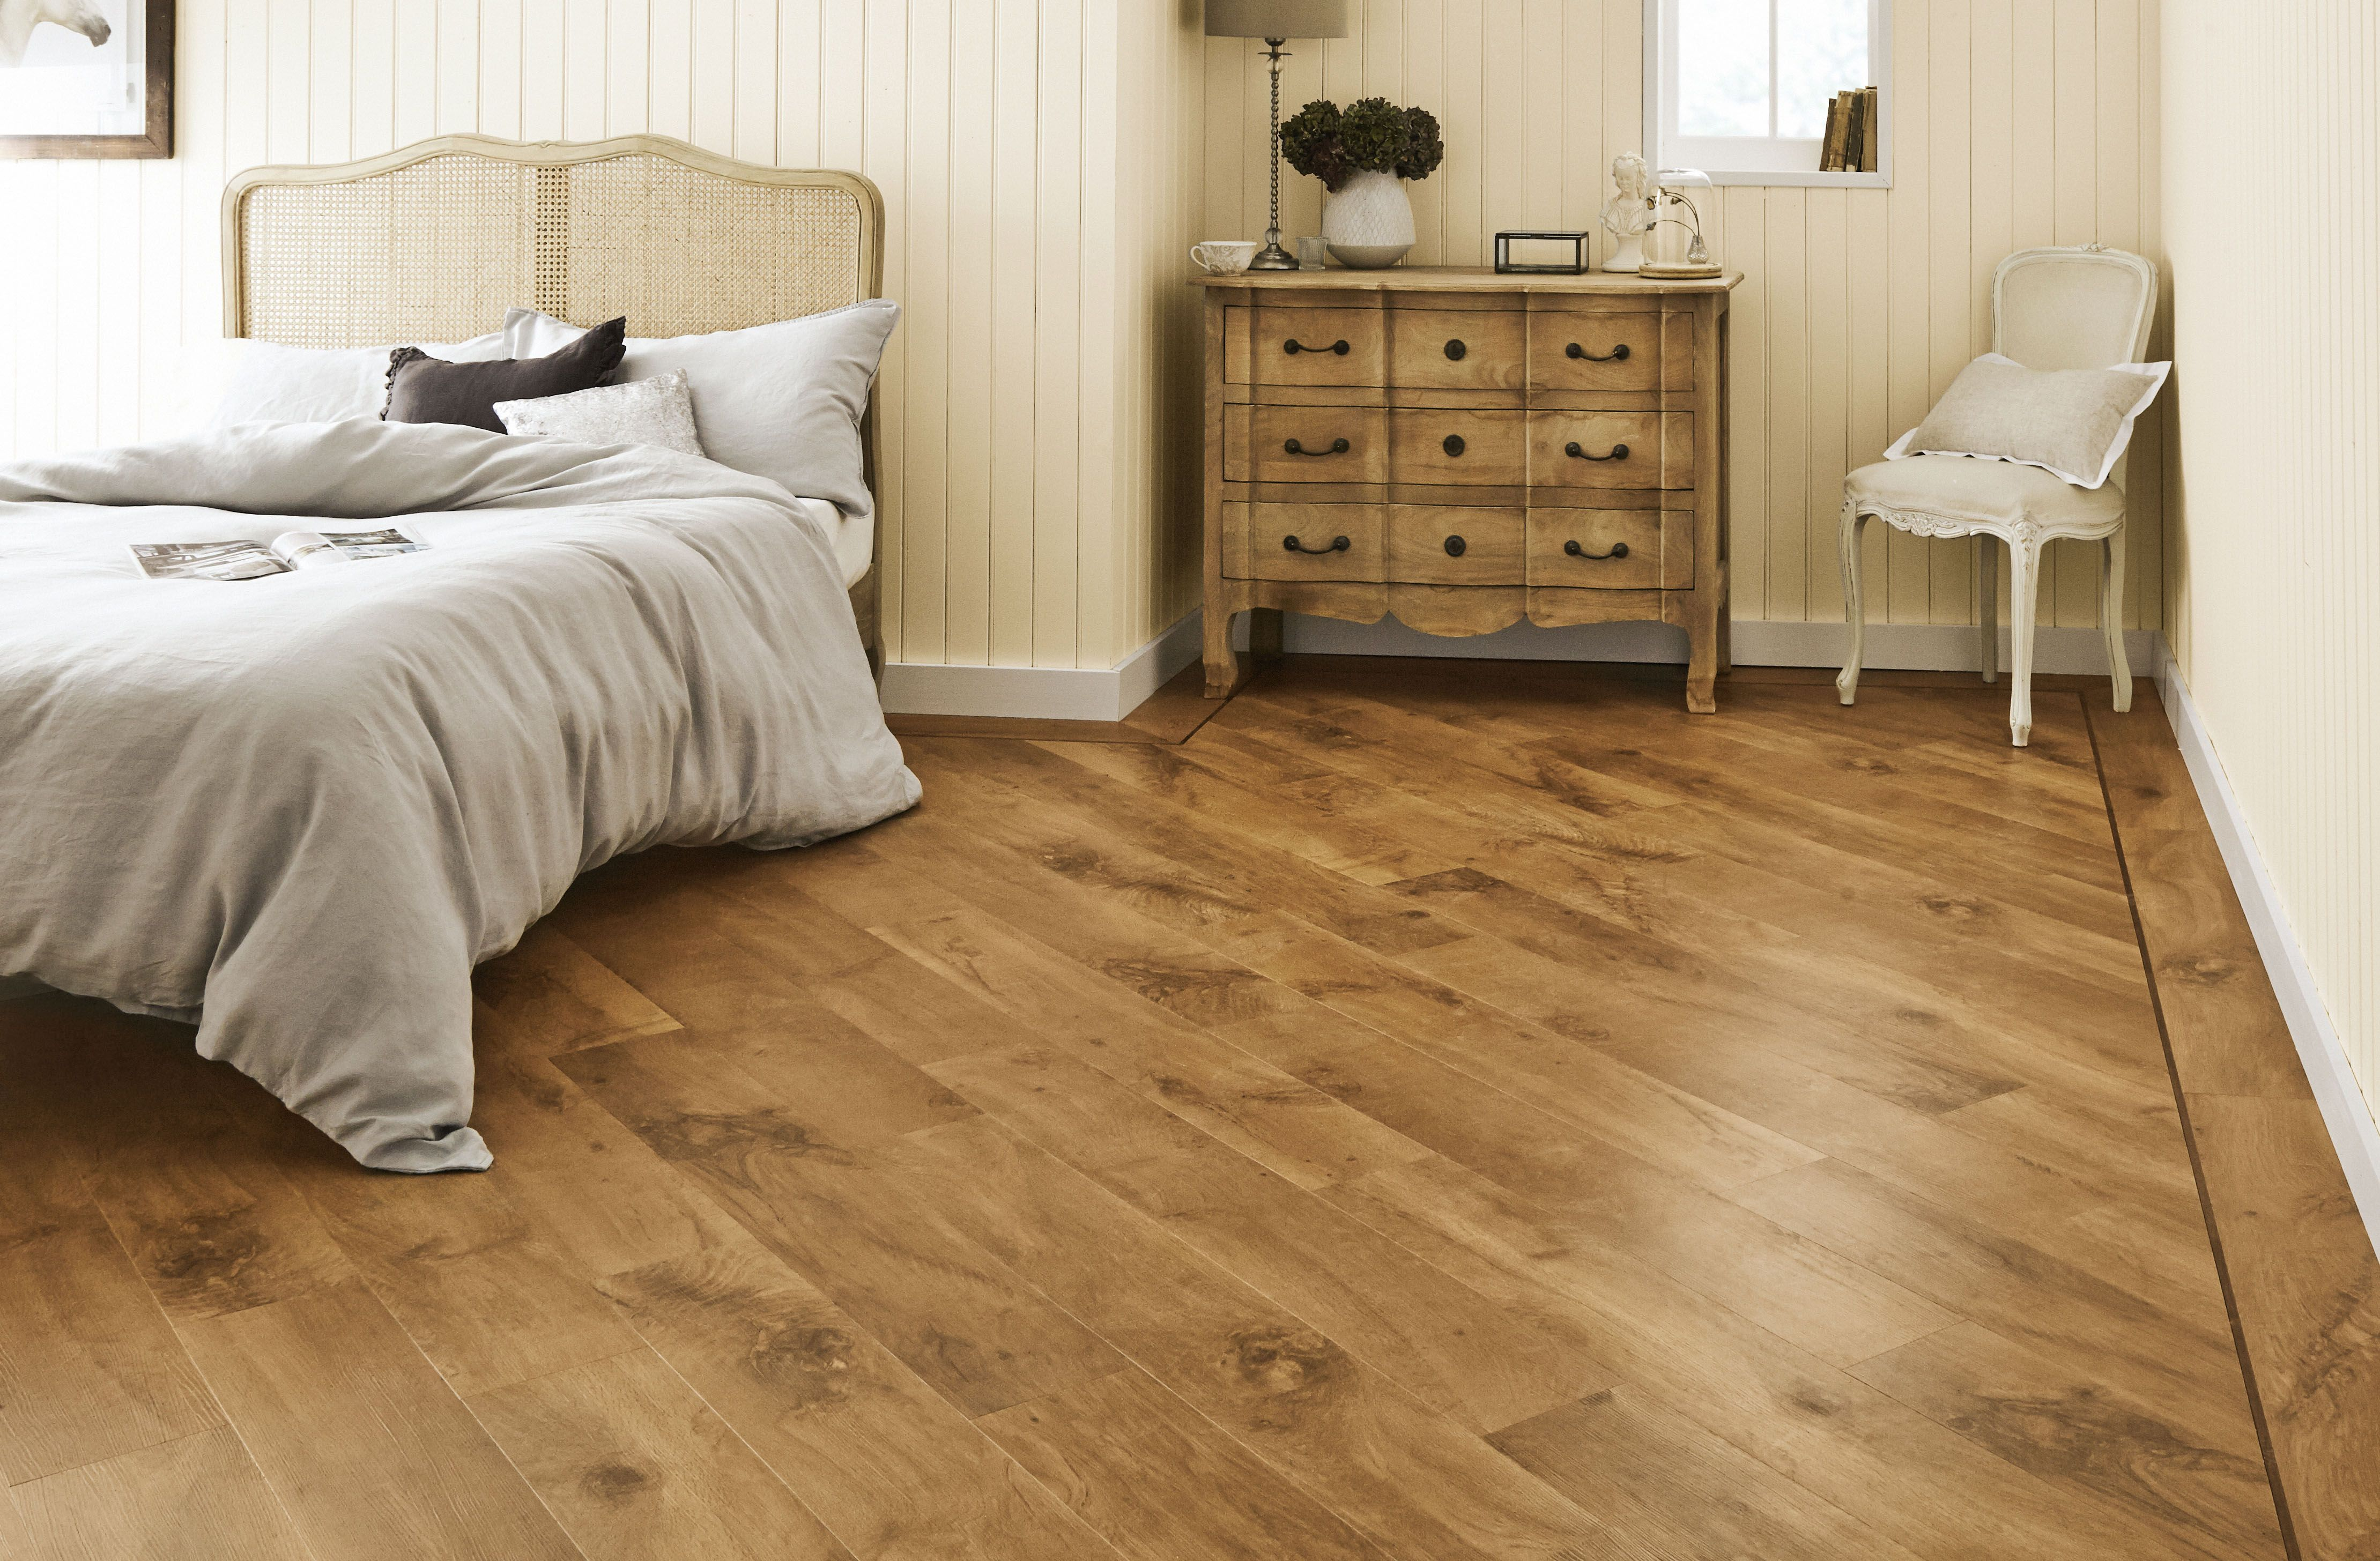 21+ John lewis bedroom flooring ppdb 2021